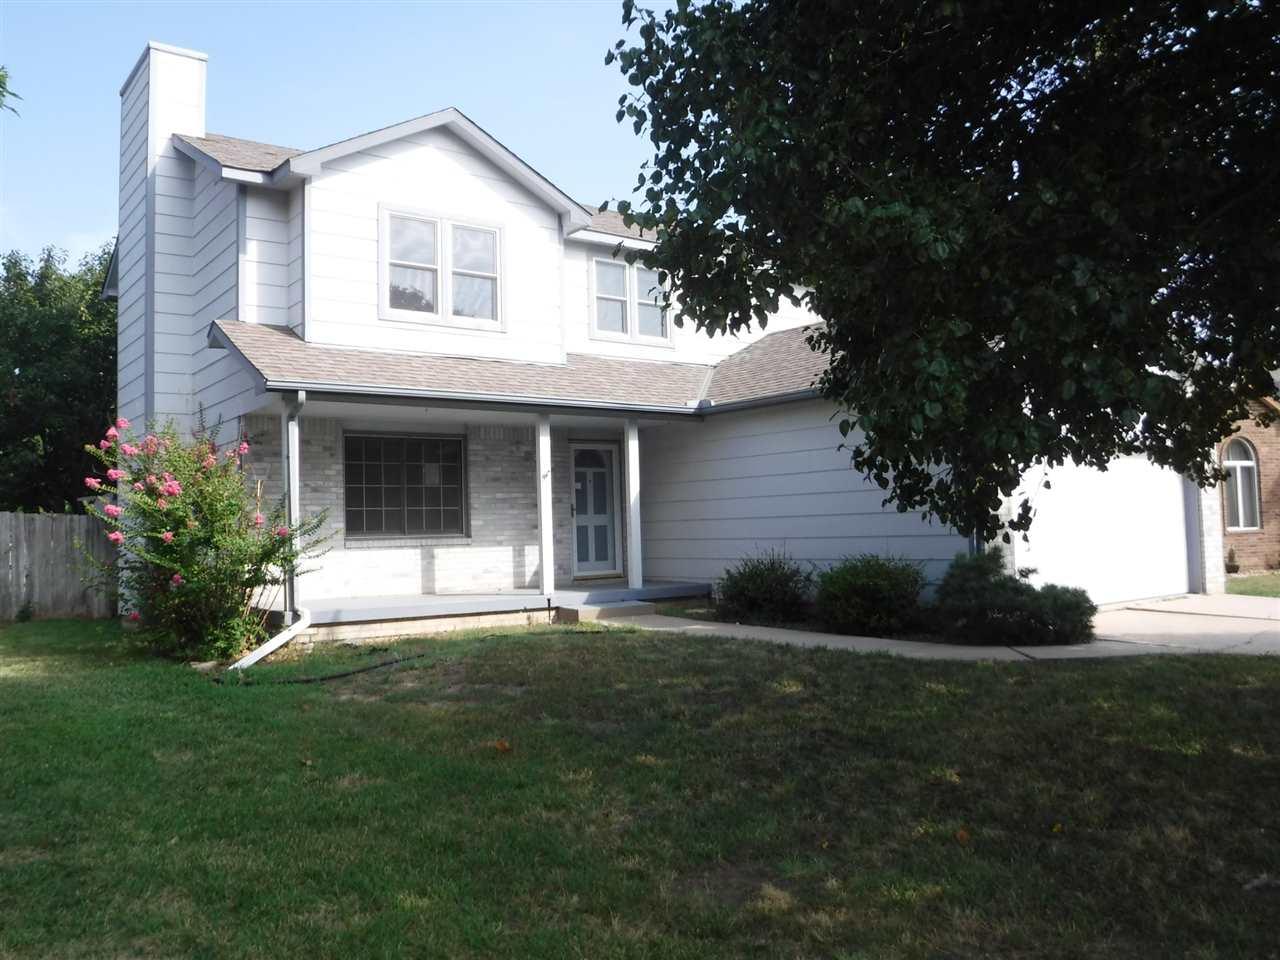 1201 S Goebel Street, Wichita, KS 67207